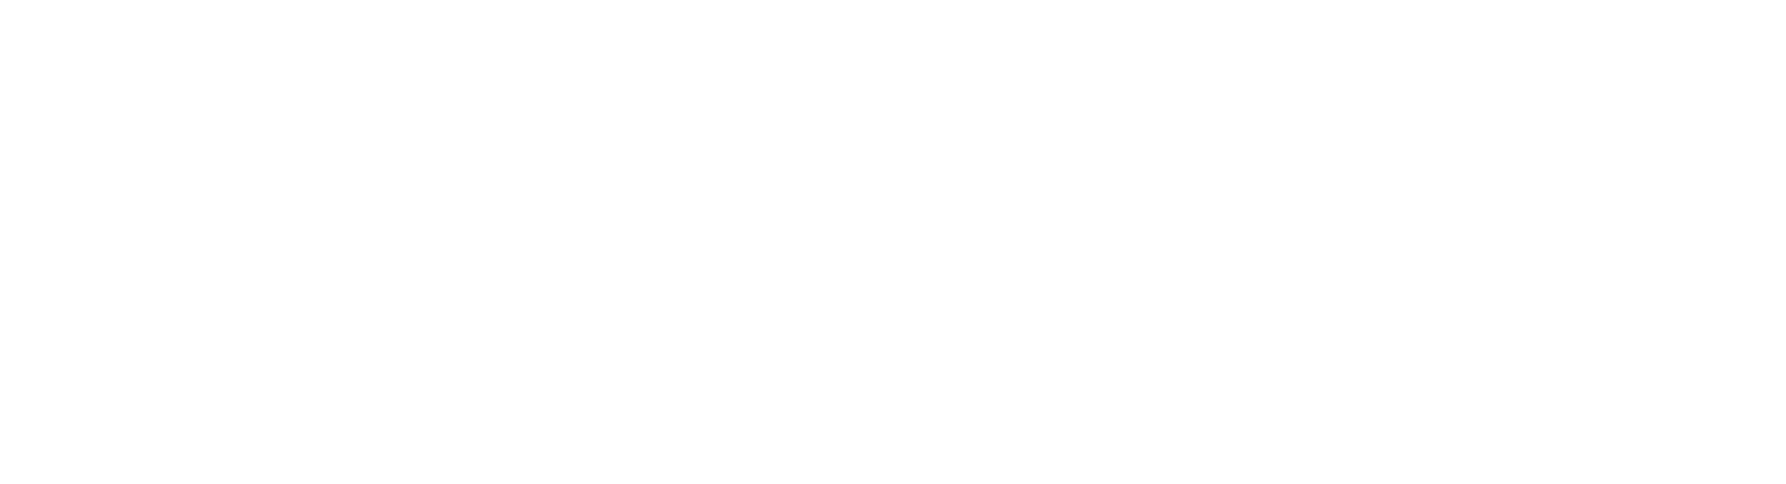 ExclusivU logo